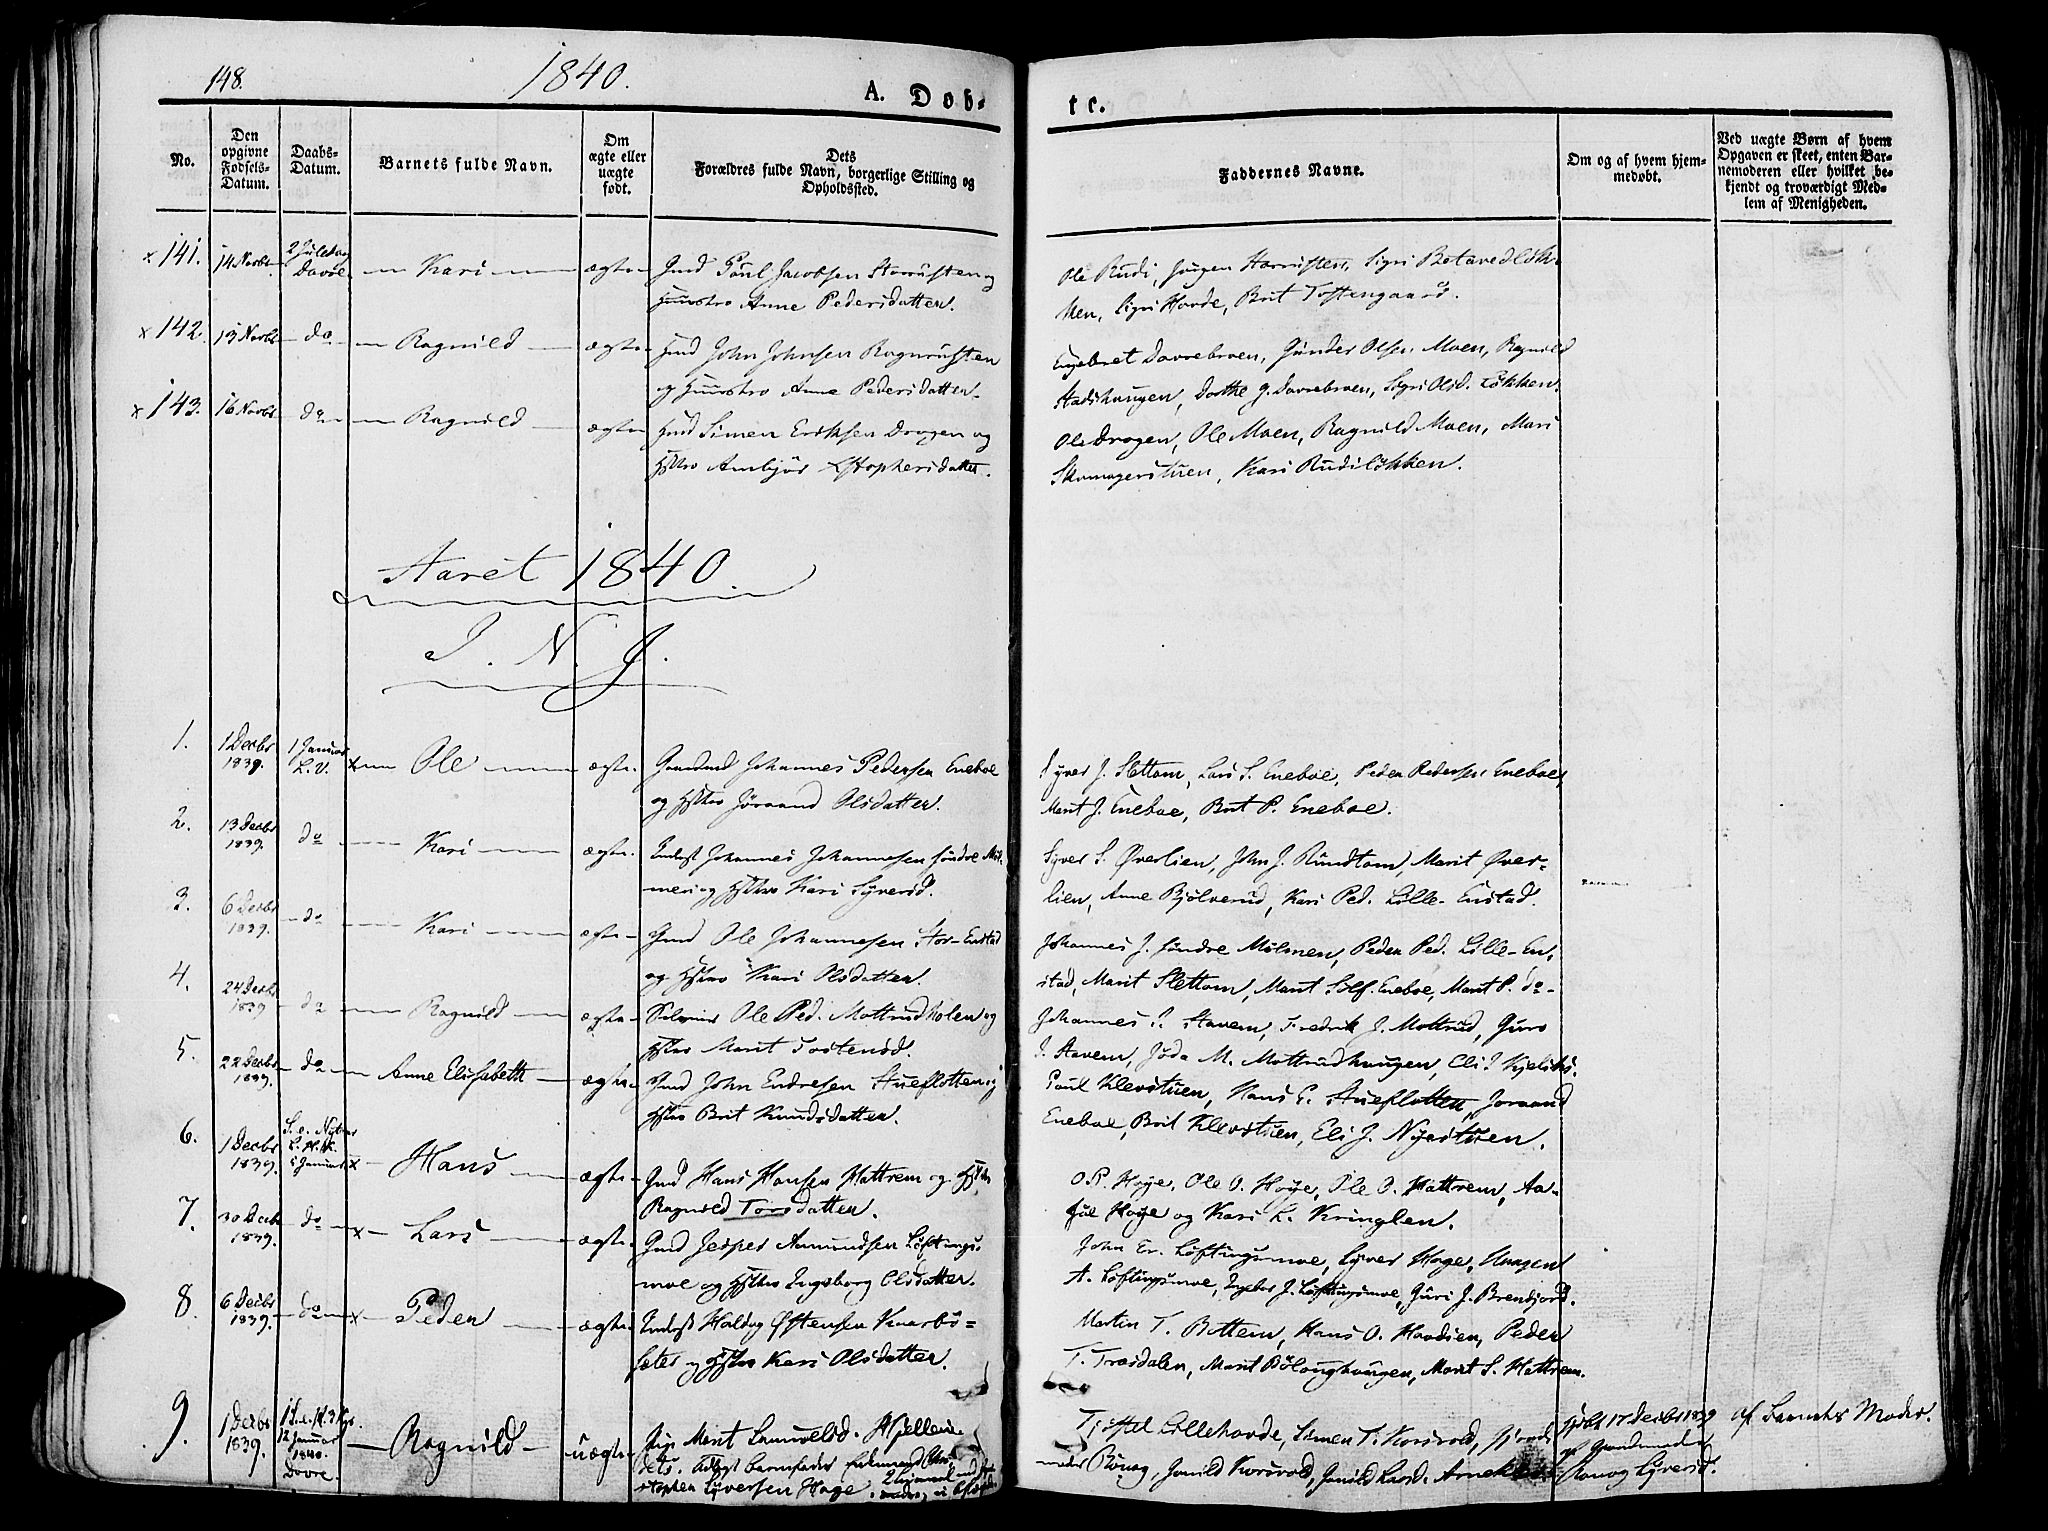 SAH, Lesja prestekontor, Ministerialbok nr. 5, 1830-1842, s. 148